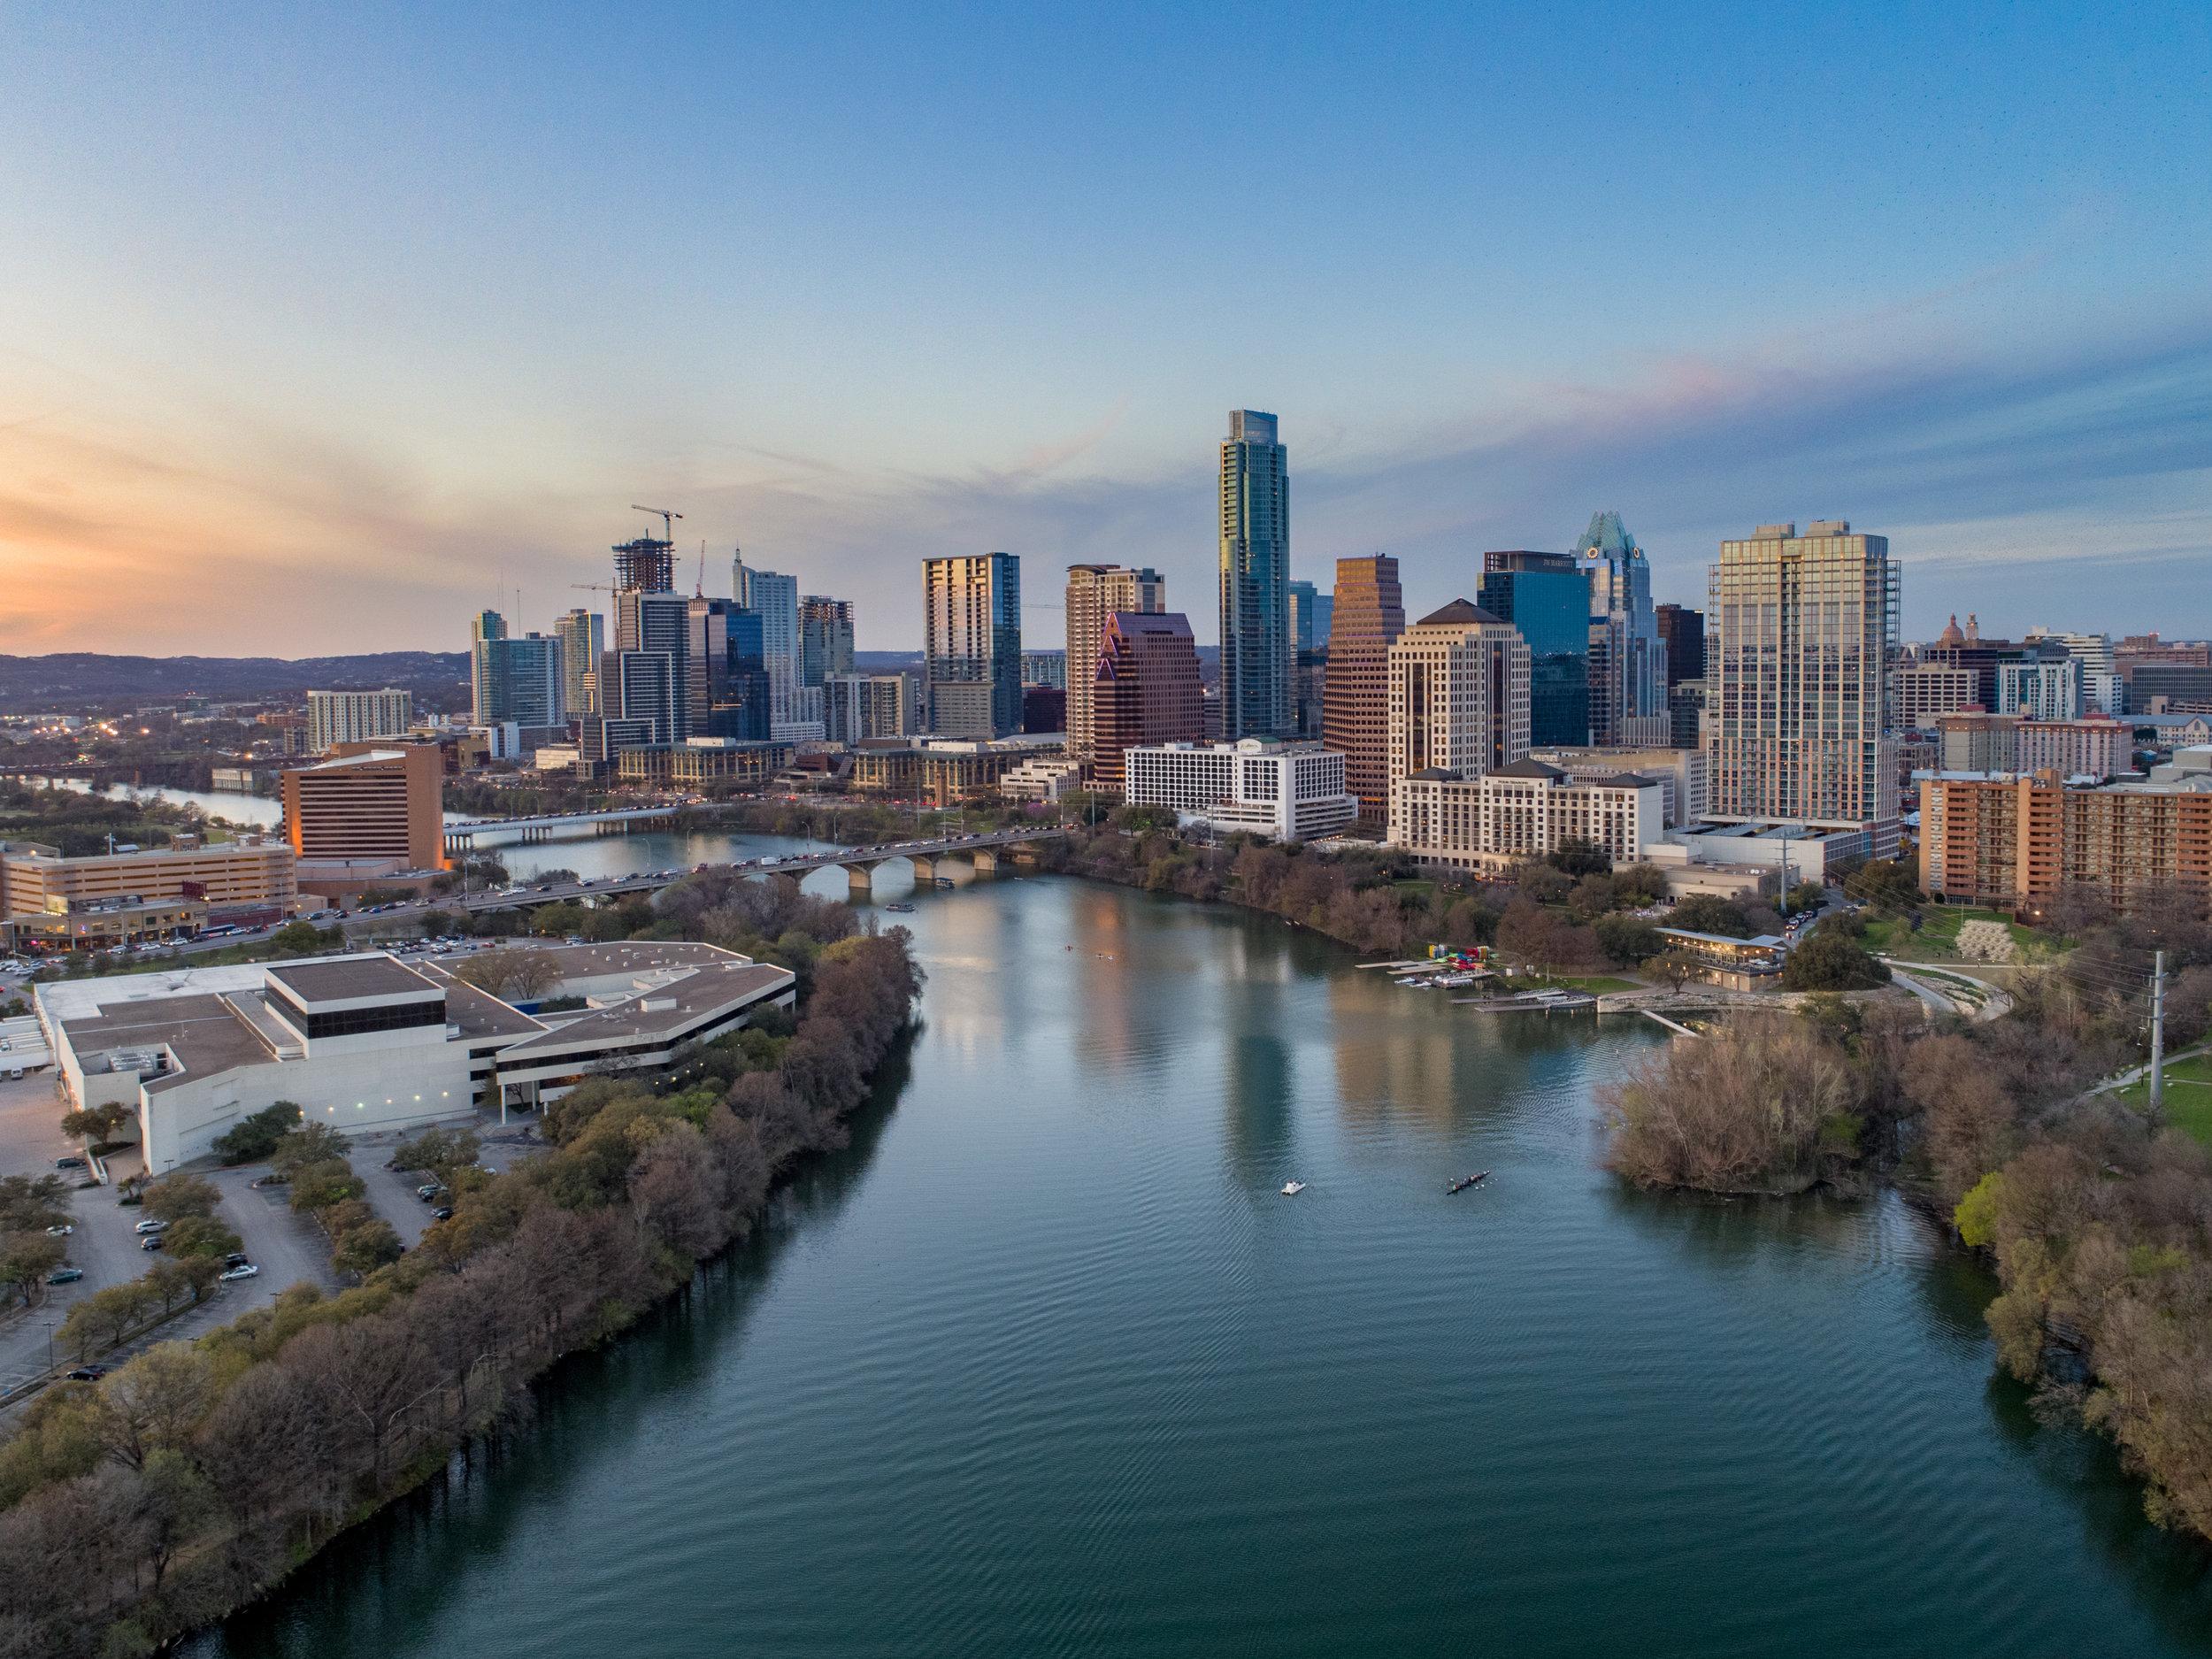 DJI_P4Adv_Austin_Sunset_March72018_2018_52-HDR-1 copy.jpg